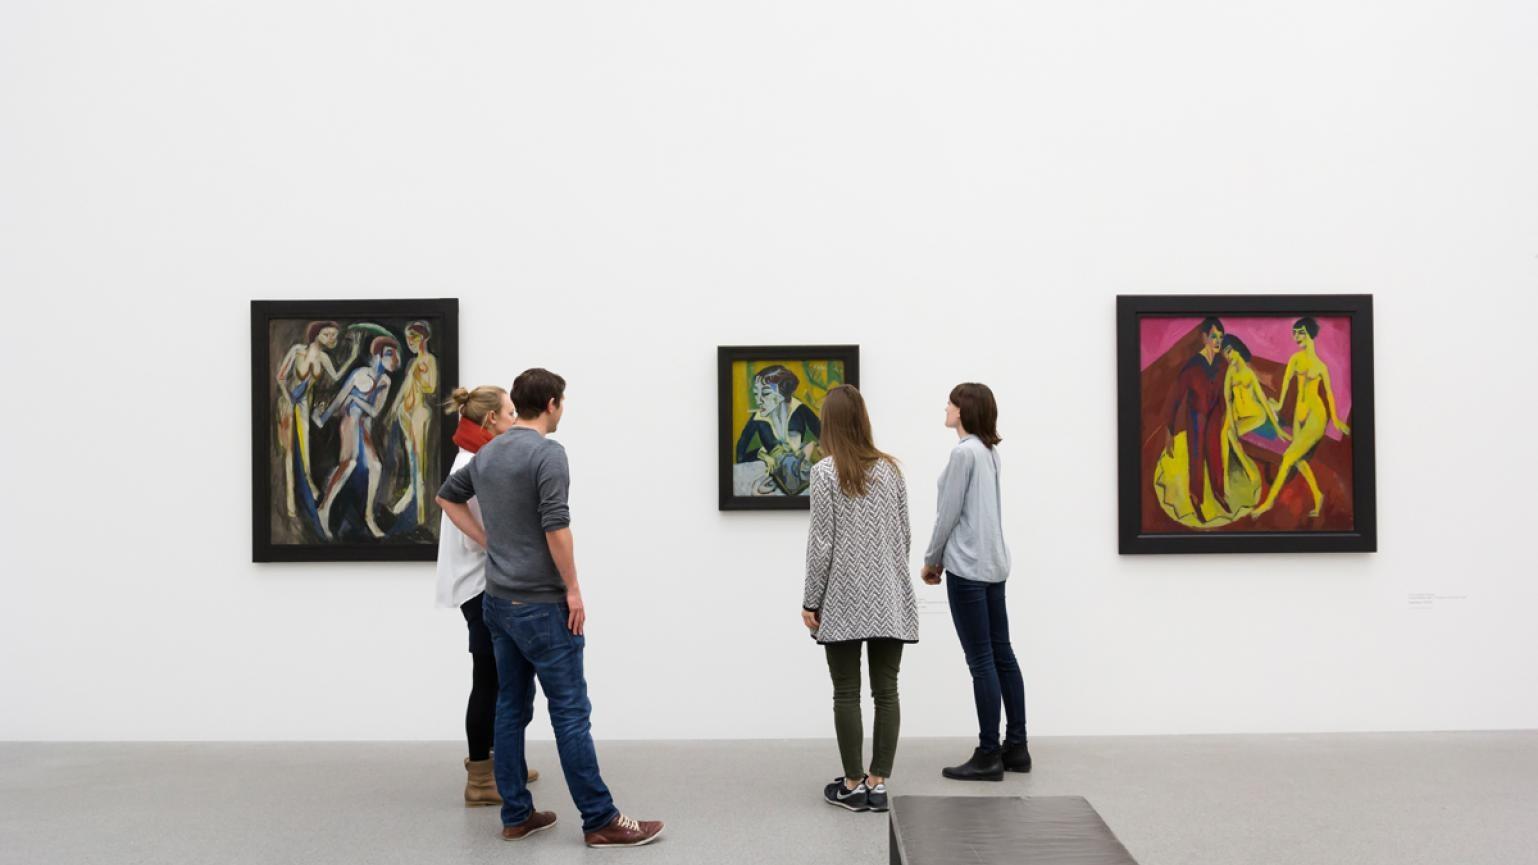 Pinakothek der Moderne museum